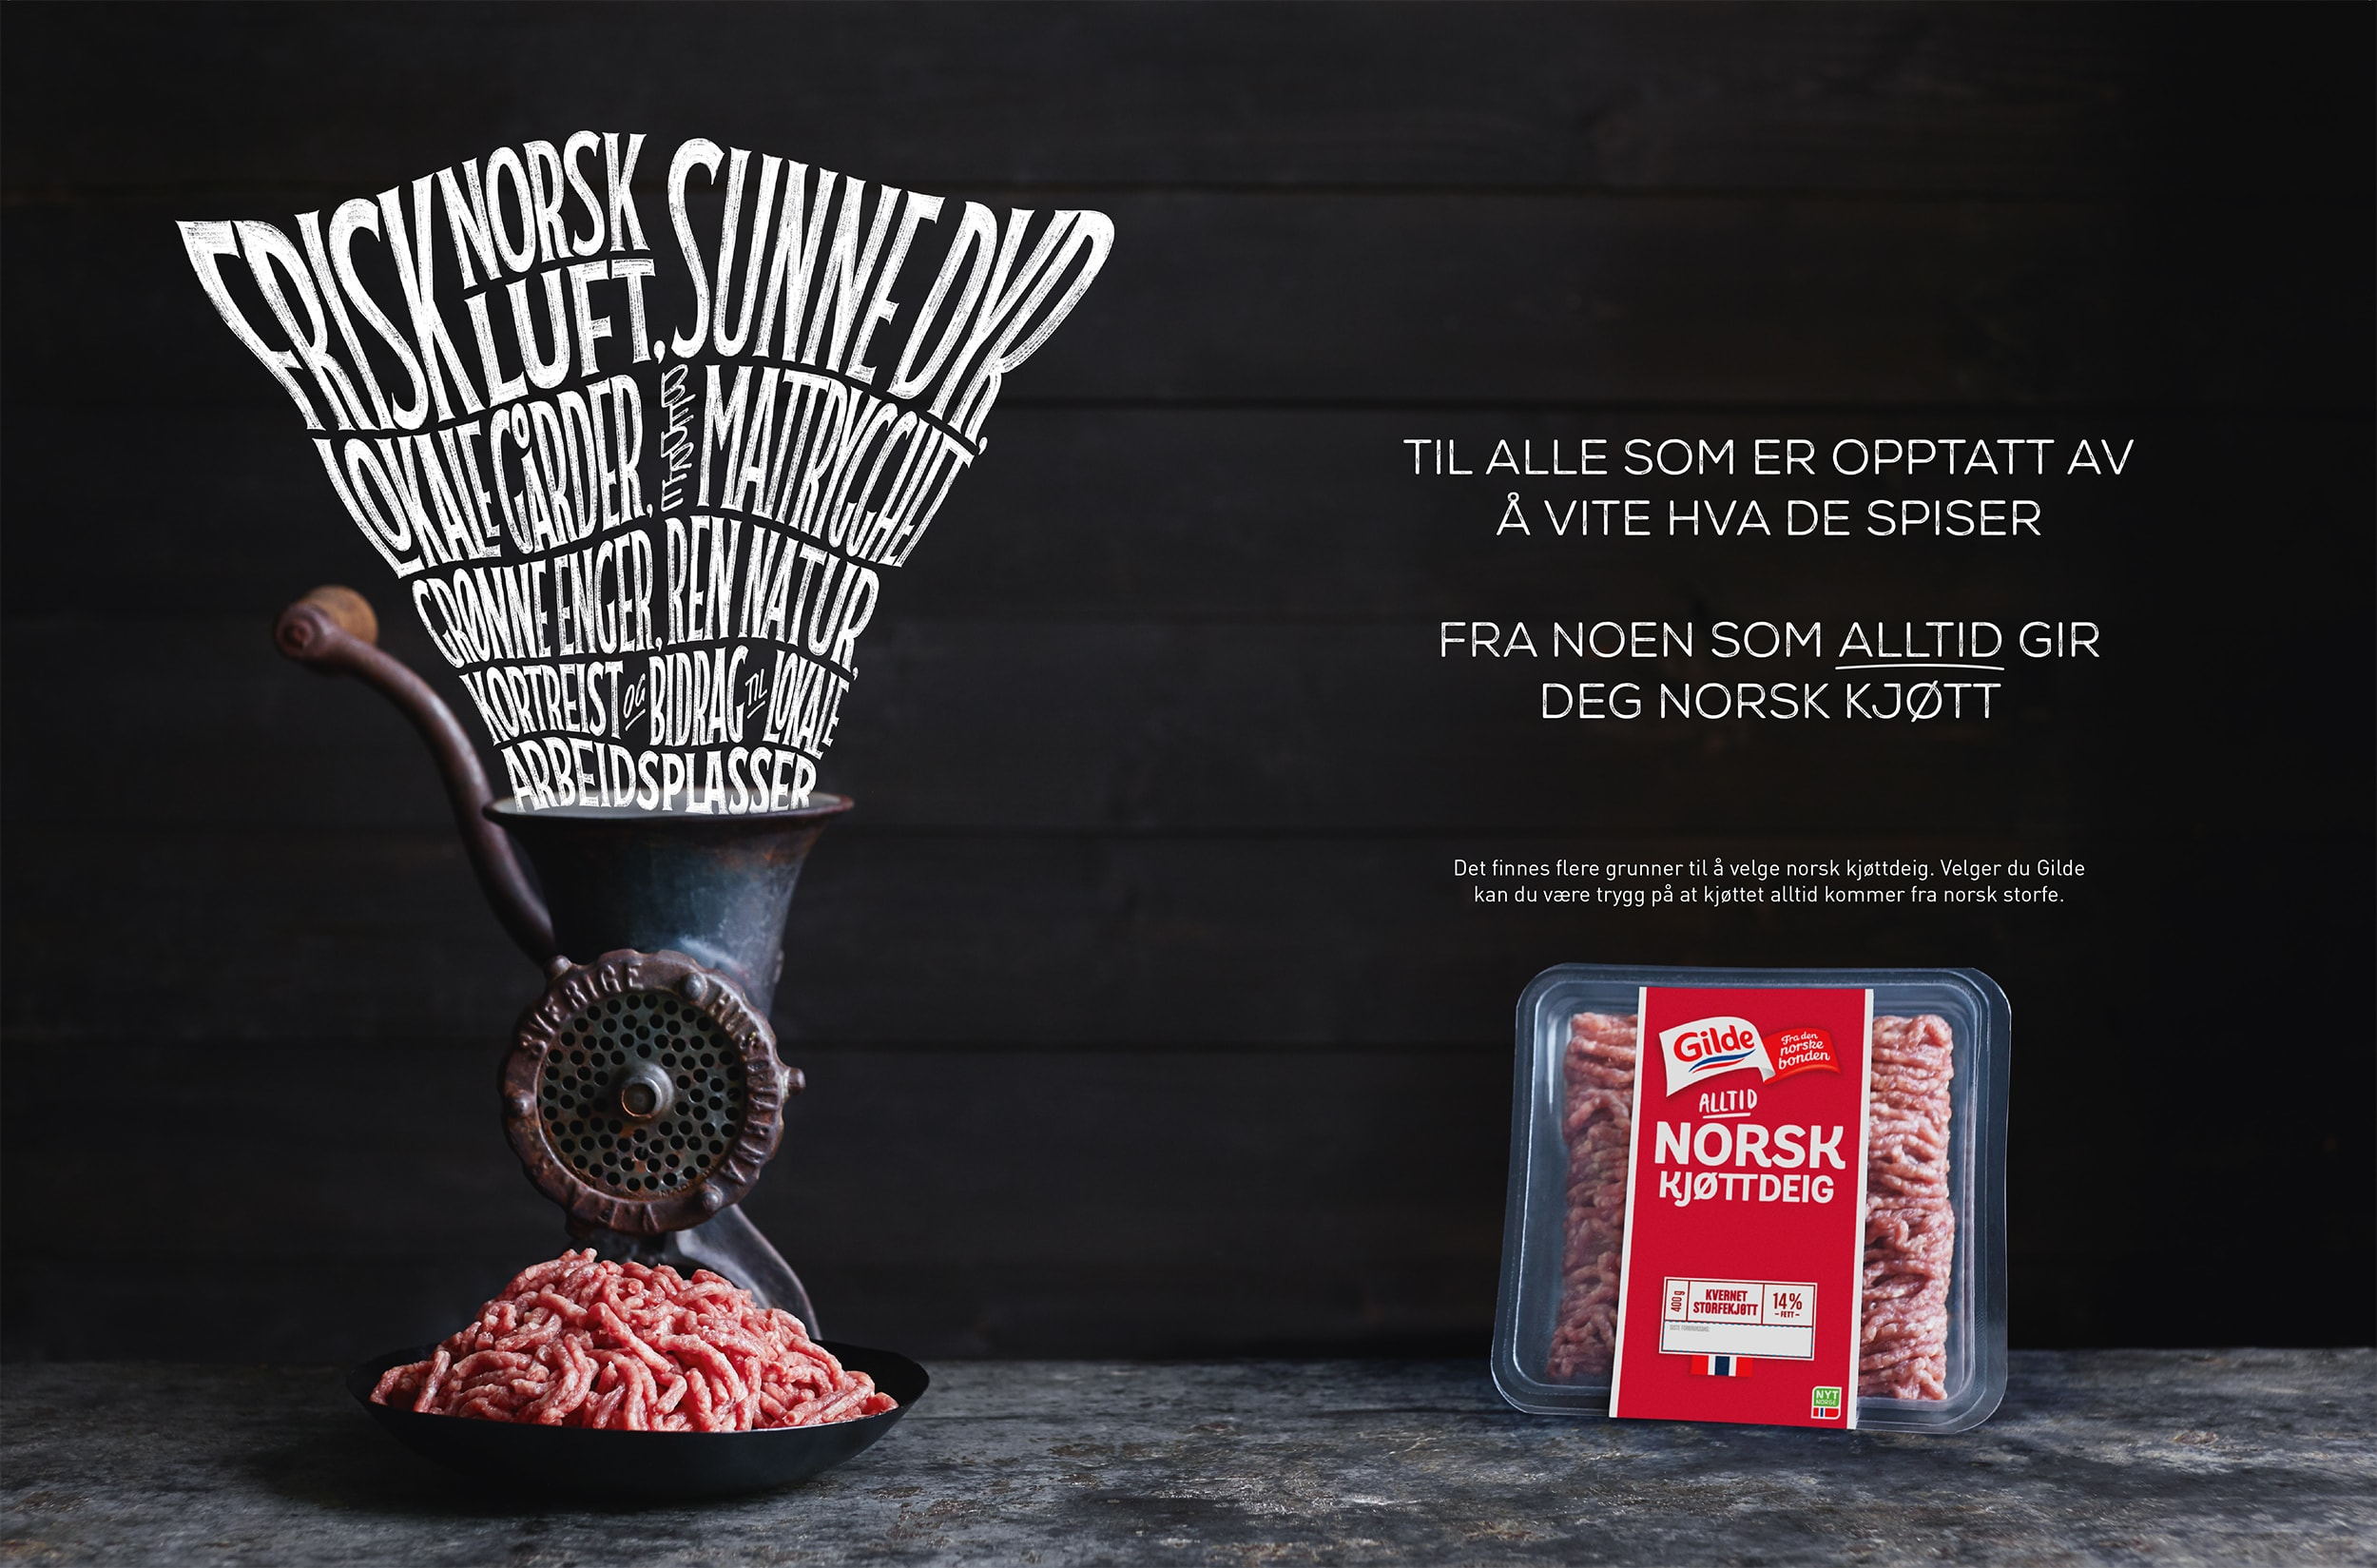 Veslemøy Vråskar – Gilde Kjøttdeig